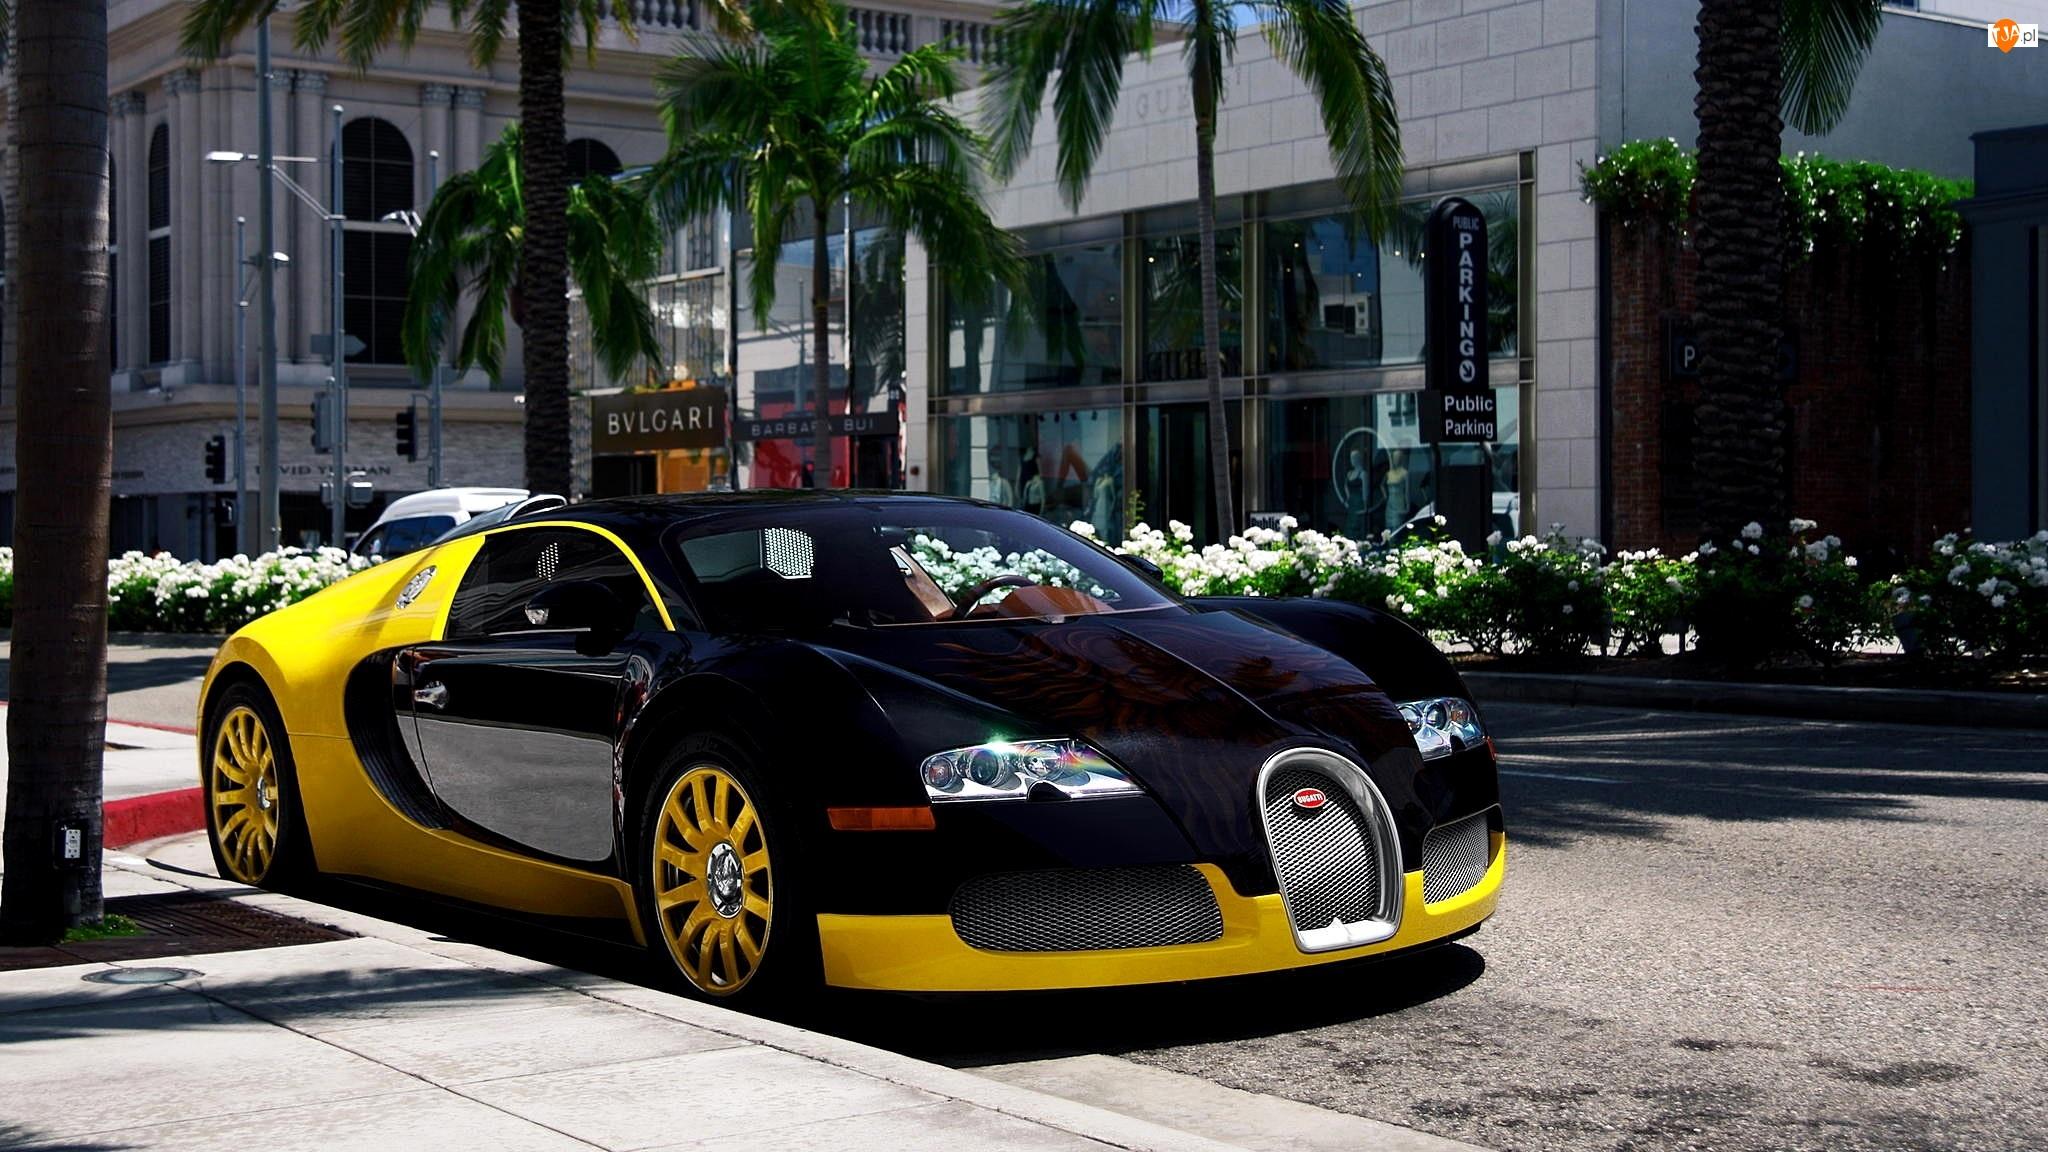 Grafitowo Żółty, Ulica, Bugatti Veyron, Miasto